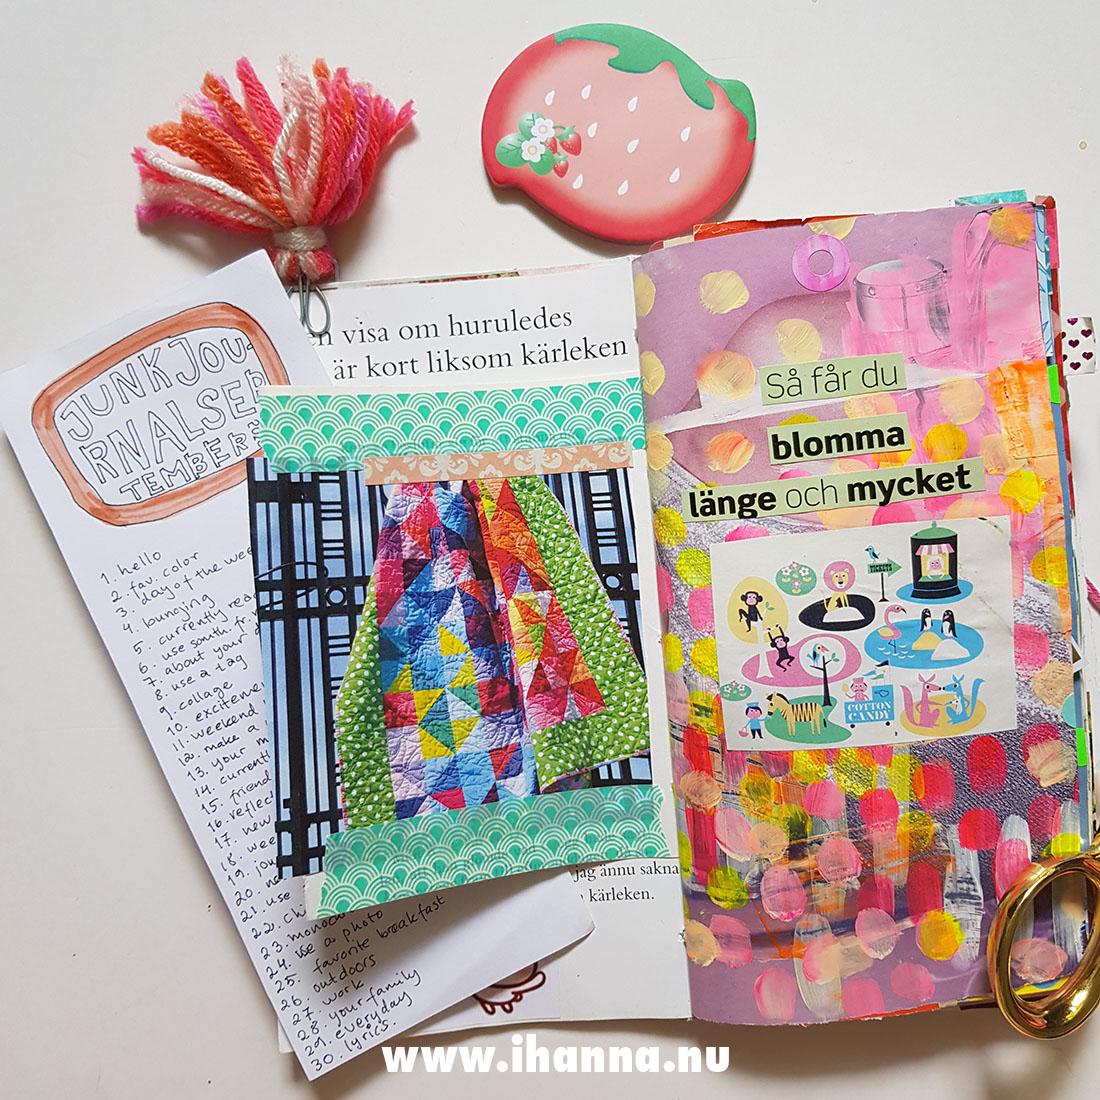 Travelers Notebook size Junk Journal made by iHanna